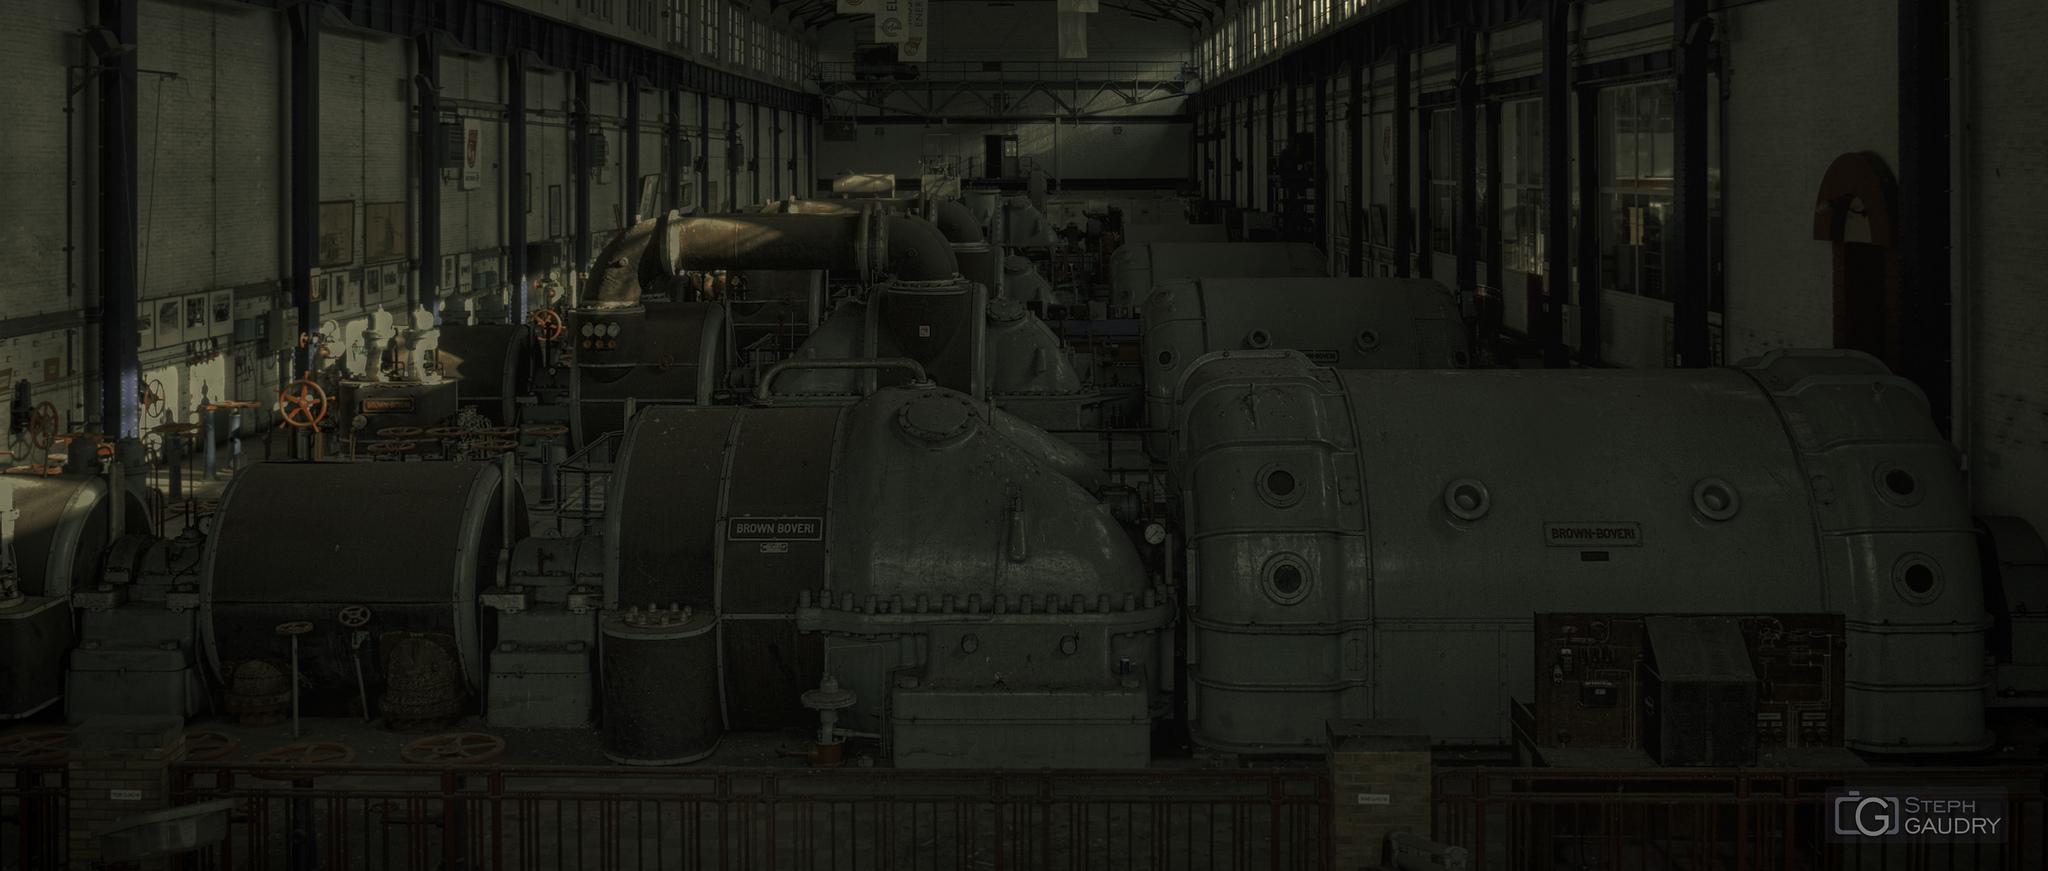 Turbines - BROWN BOVERI [Klik om de diavoorstelling te starten]